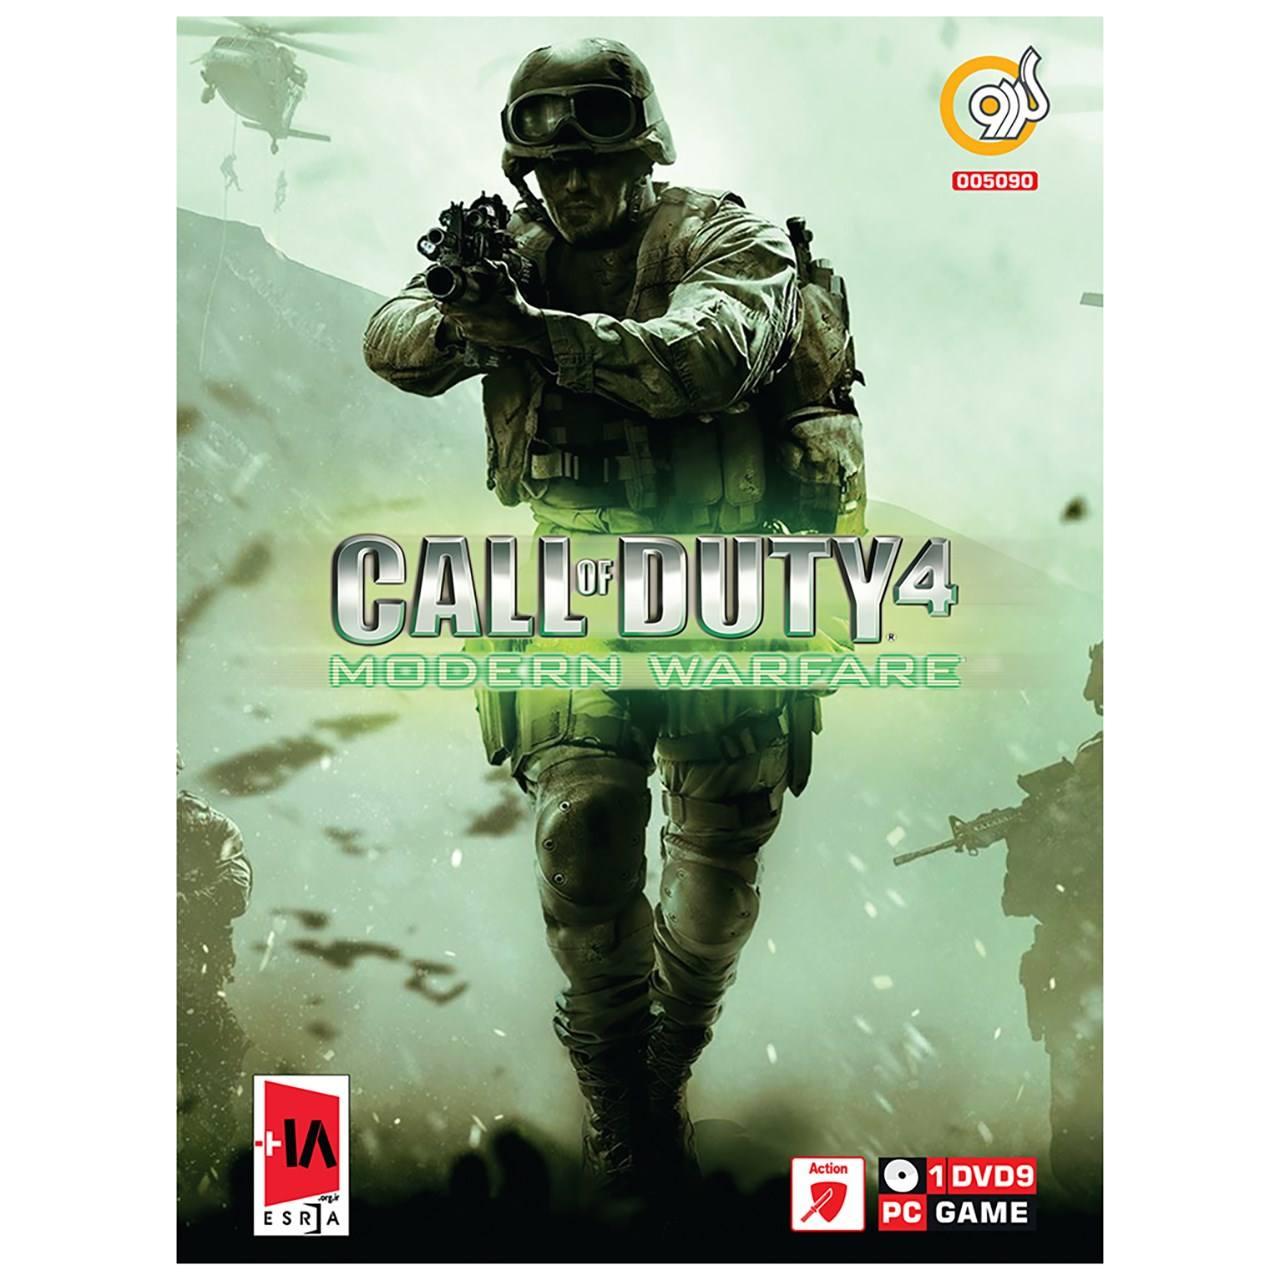 بازی Call Of Duty 4: Modern Warfare مخصوص PC